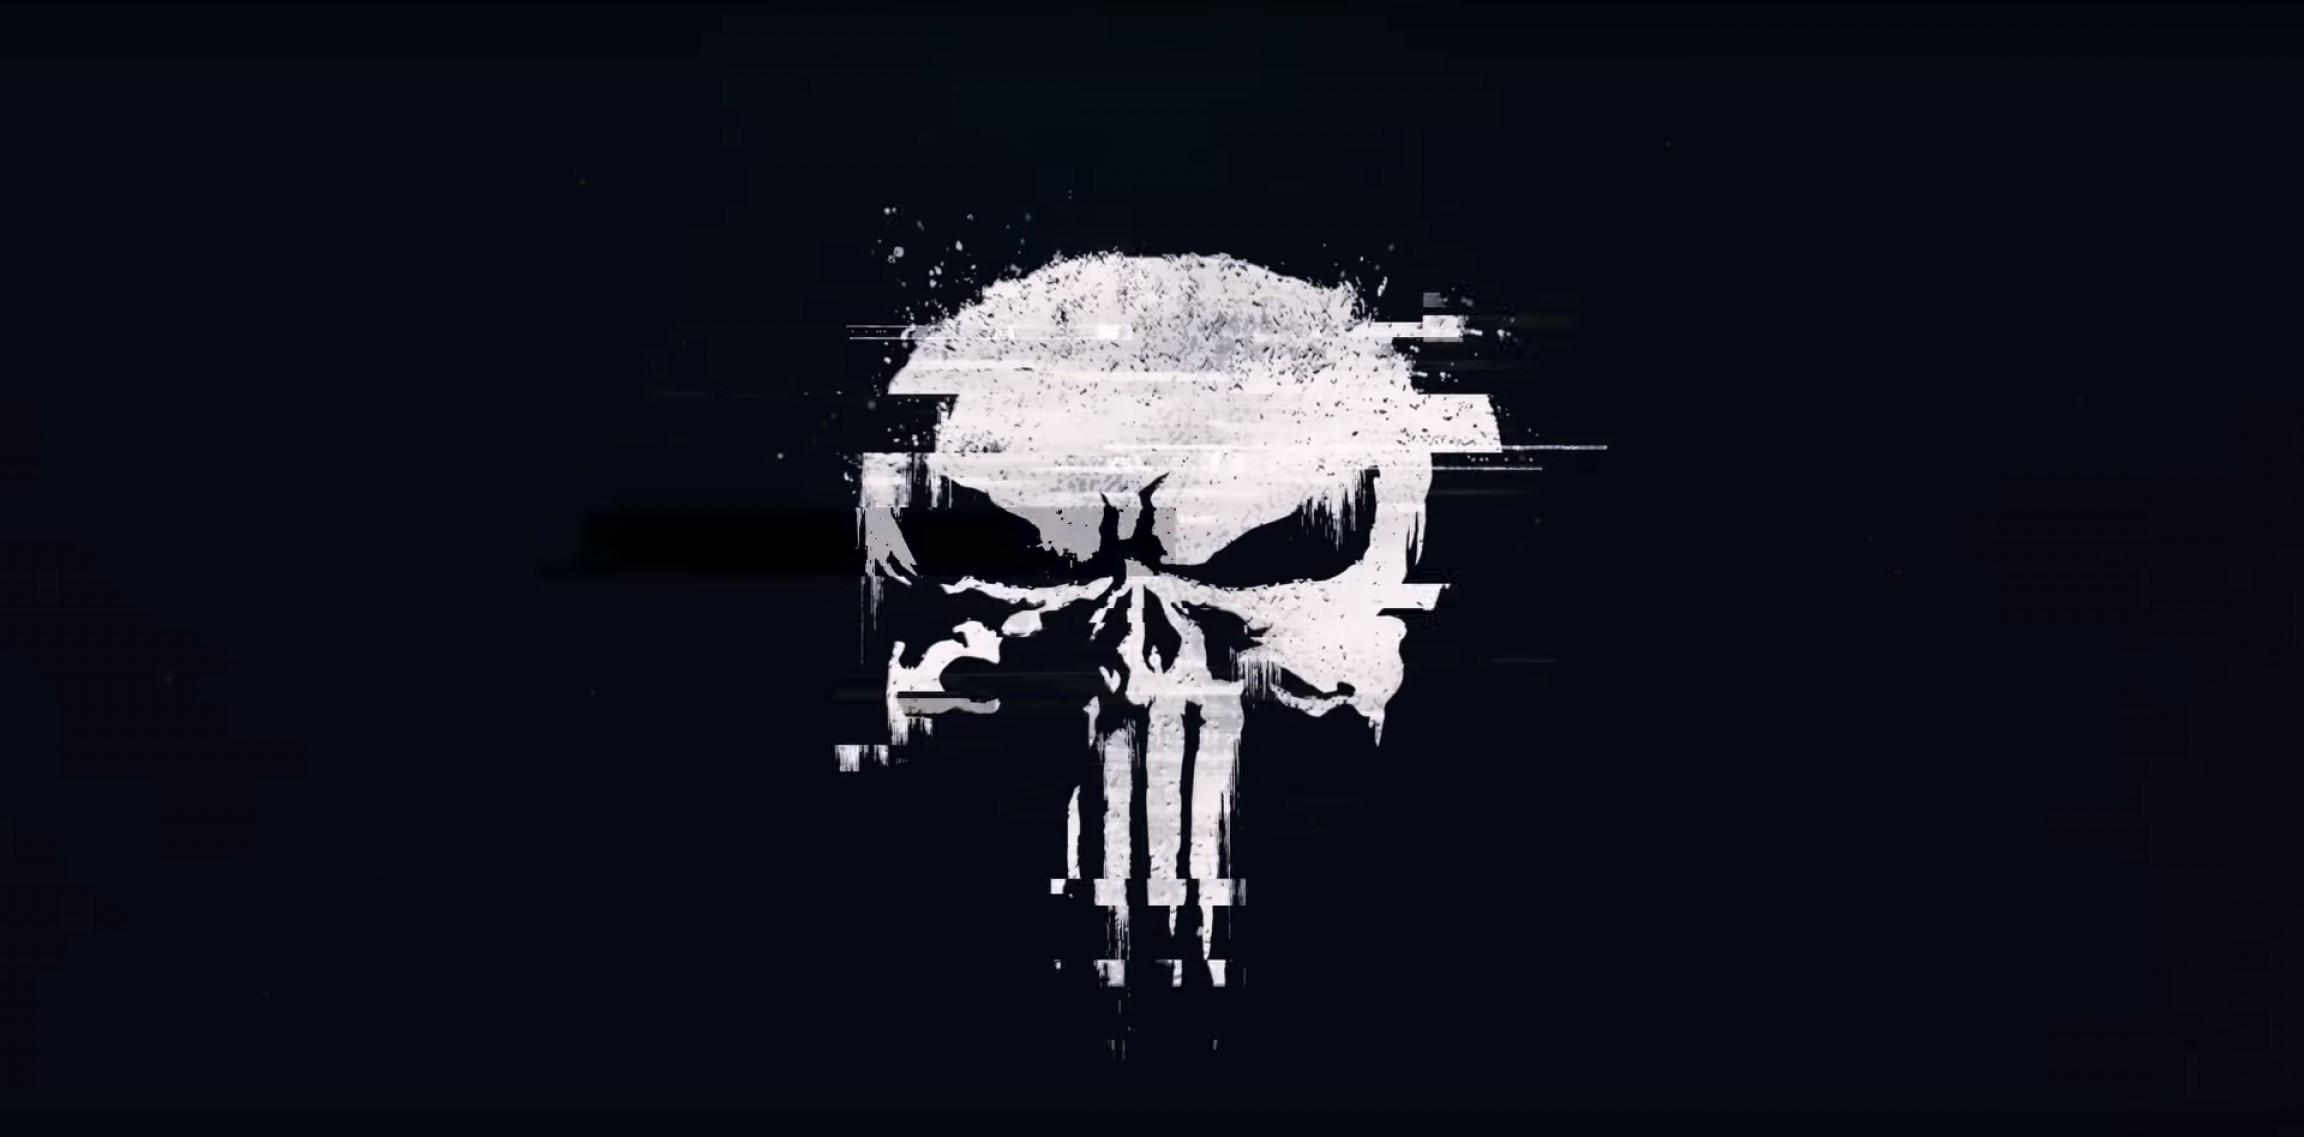 2304x1137 Marvel Netflix Punisher Skull Meaning Cops Soldiers Geekchicpro